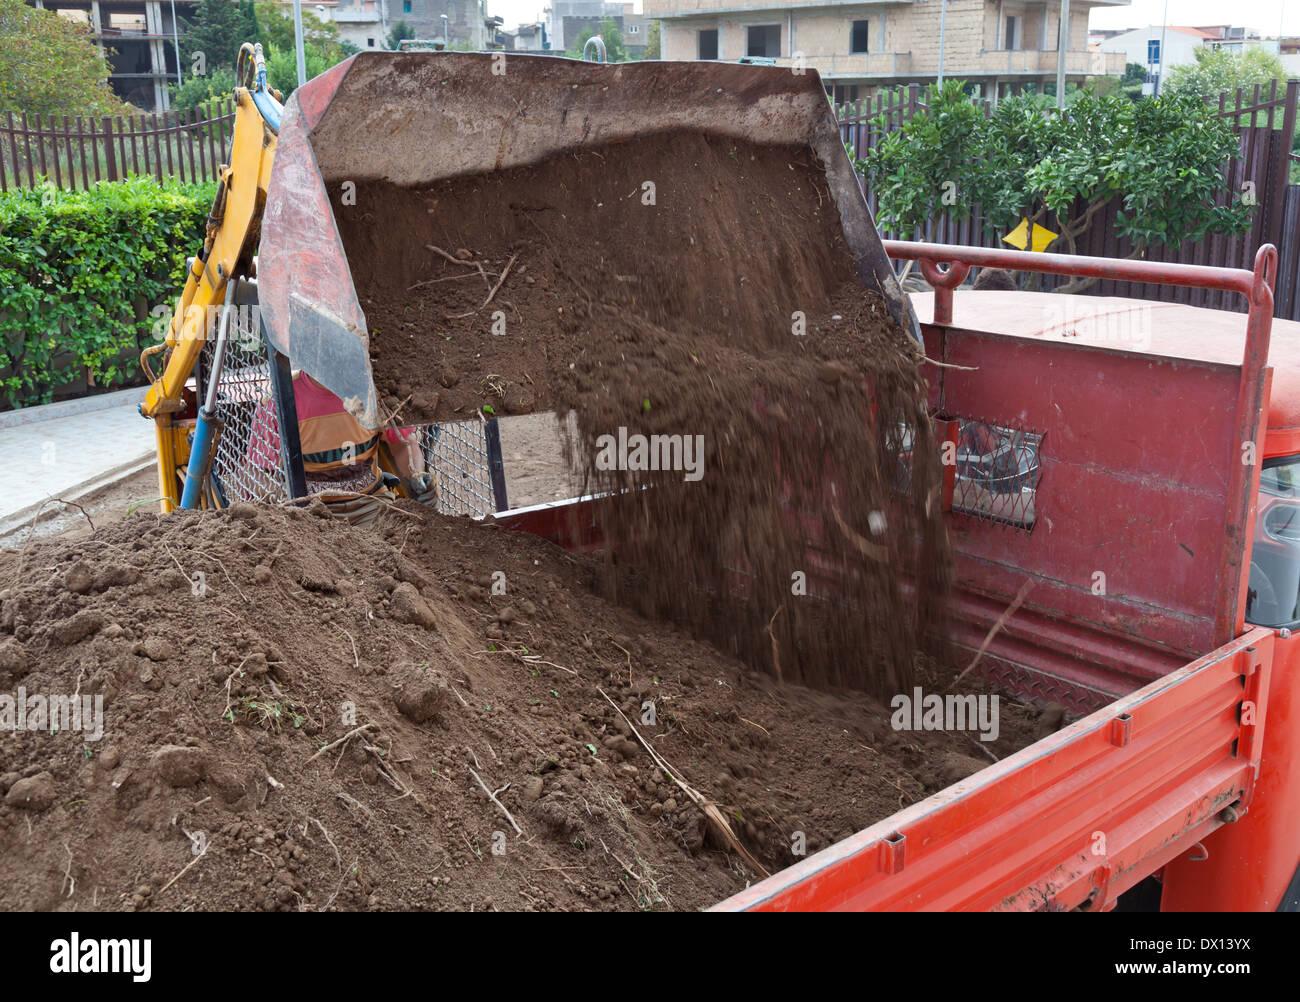 Bagger Laden Boden In Lkw Kipper Im Garten Stockfoto Bild 67637246